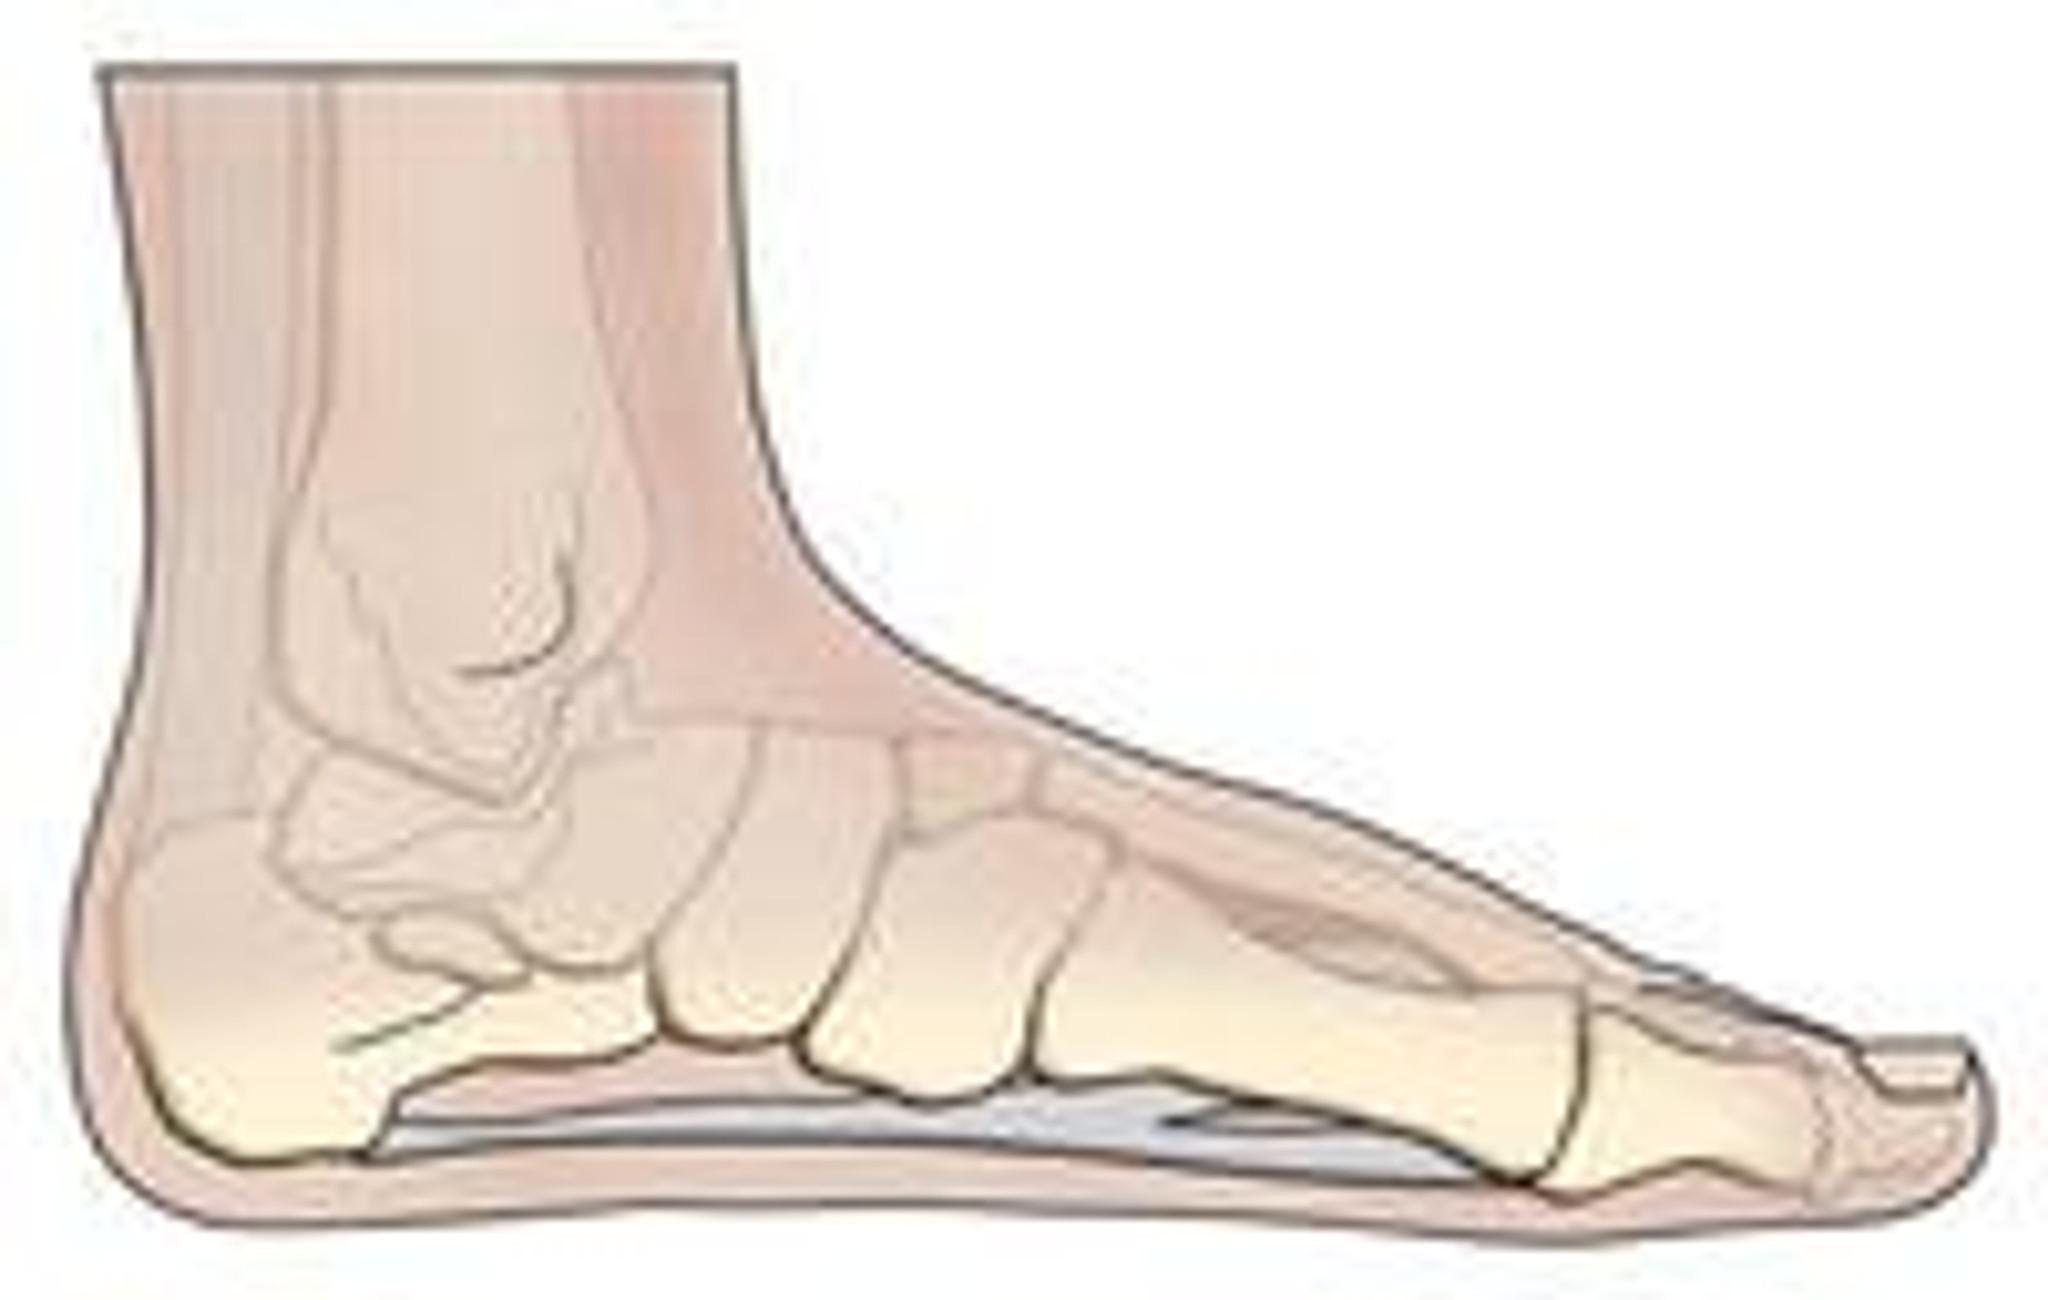 Flat Feet or Plantar Fasciitis